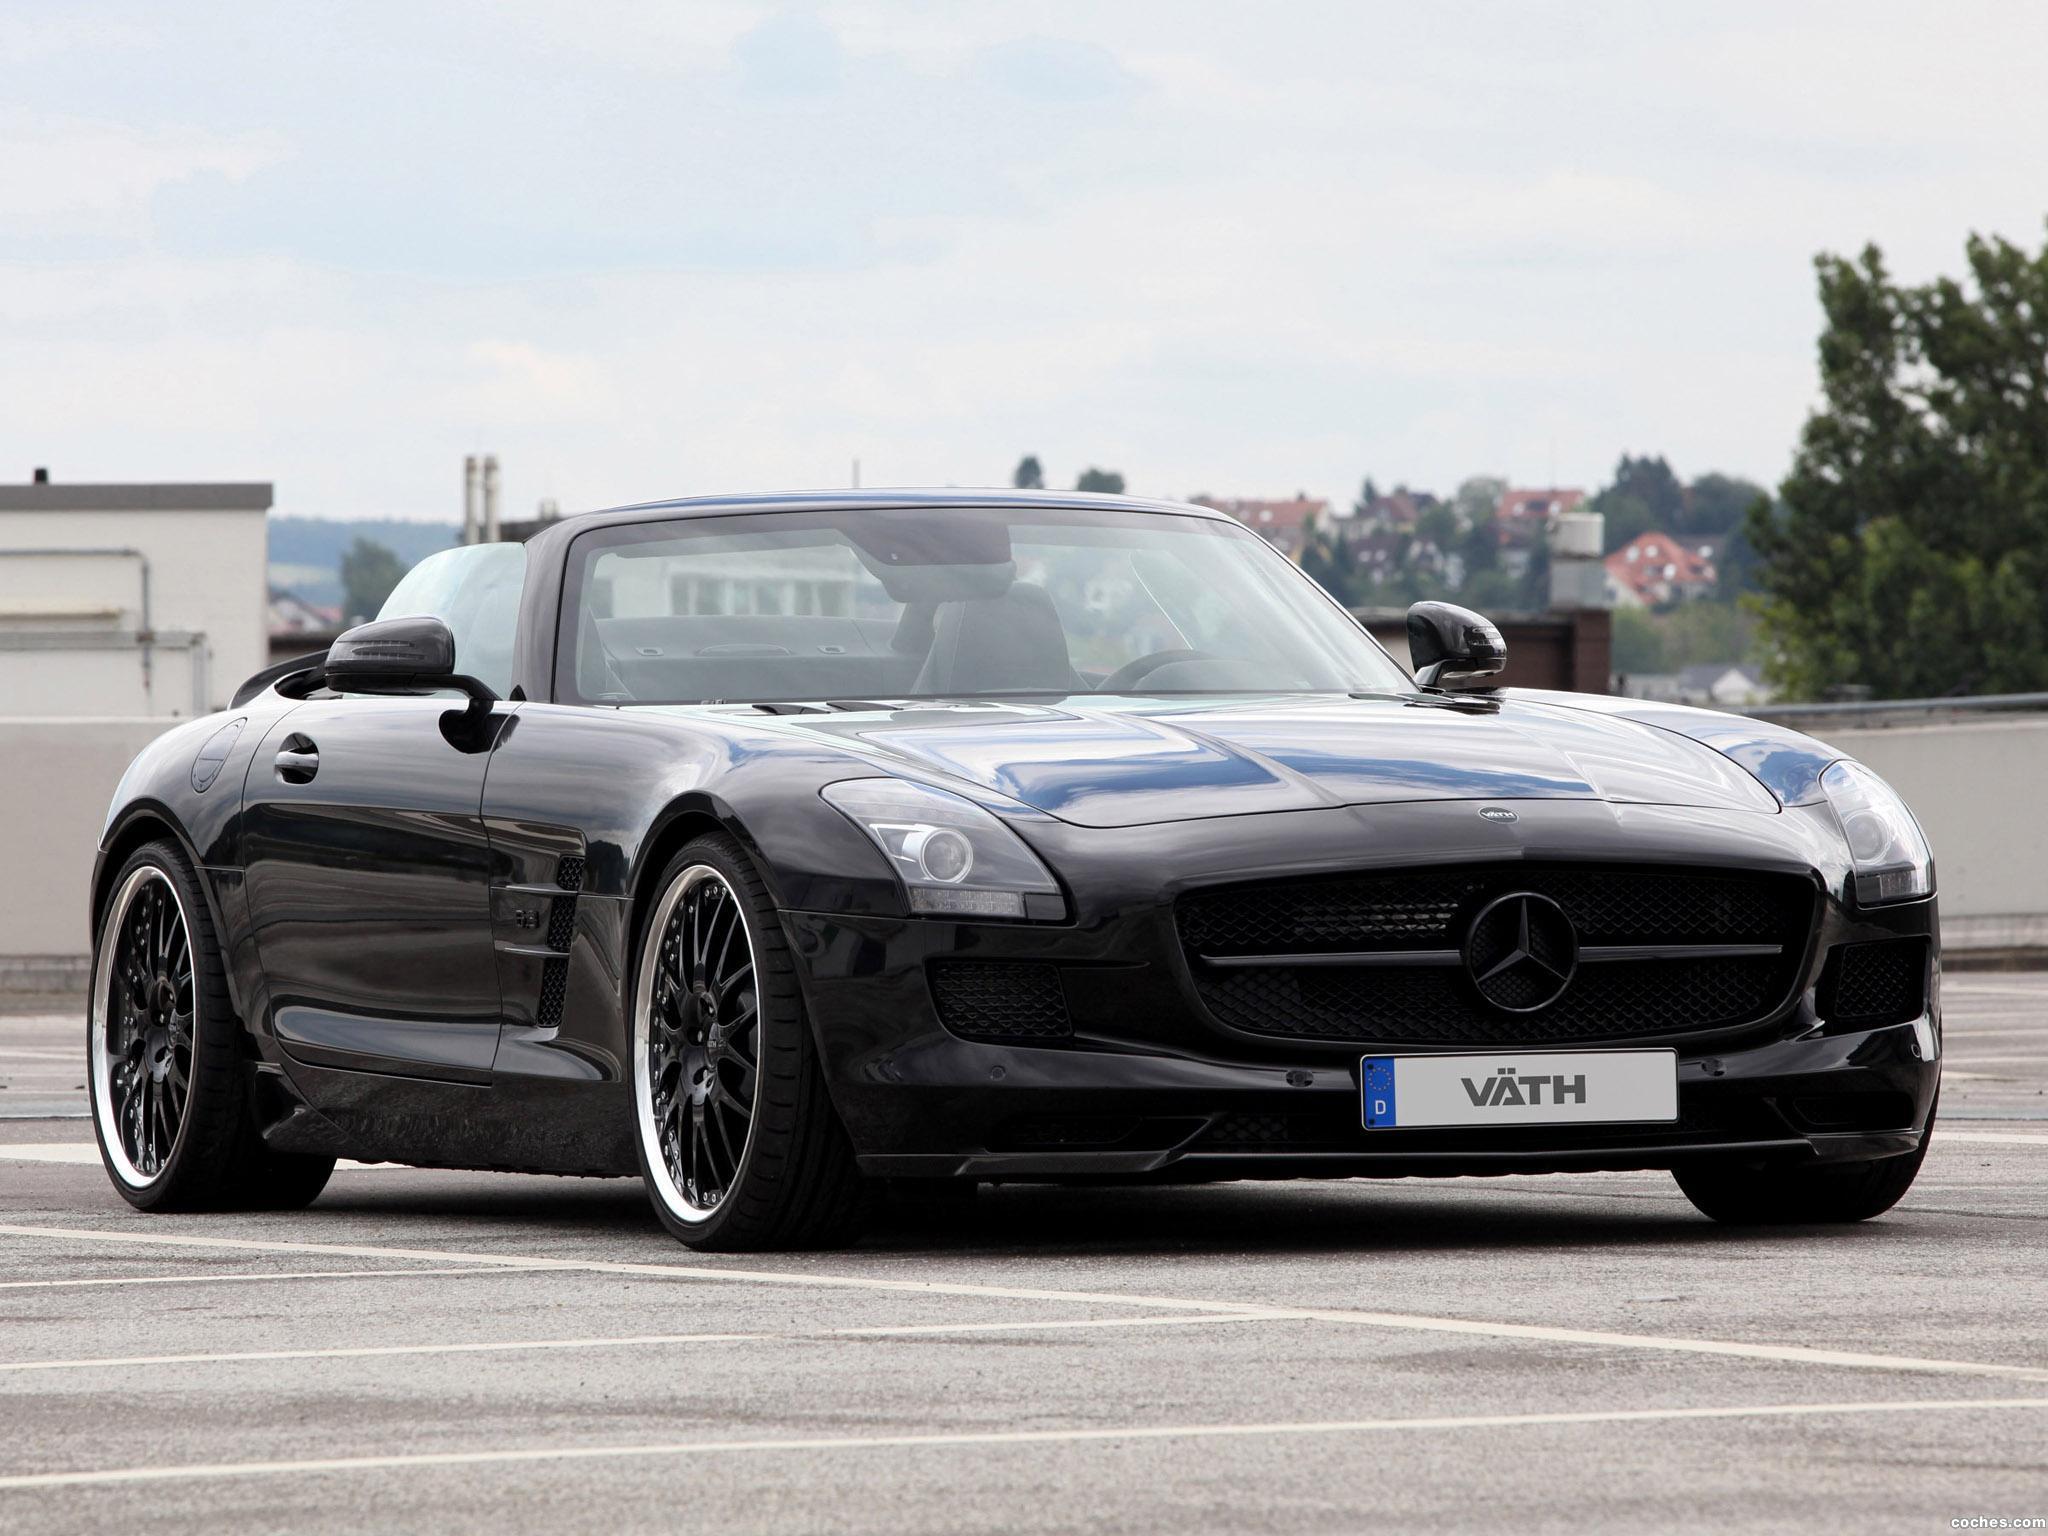 vath_amg-mercedes-sls-roadster-2012_r8